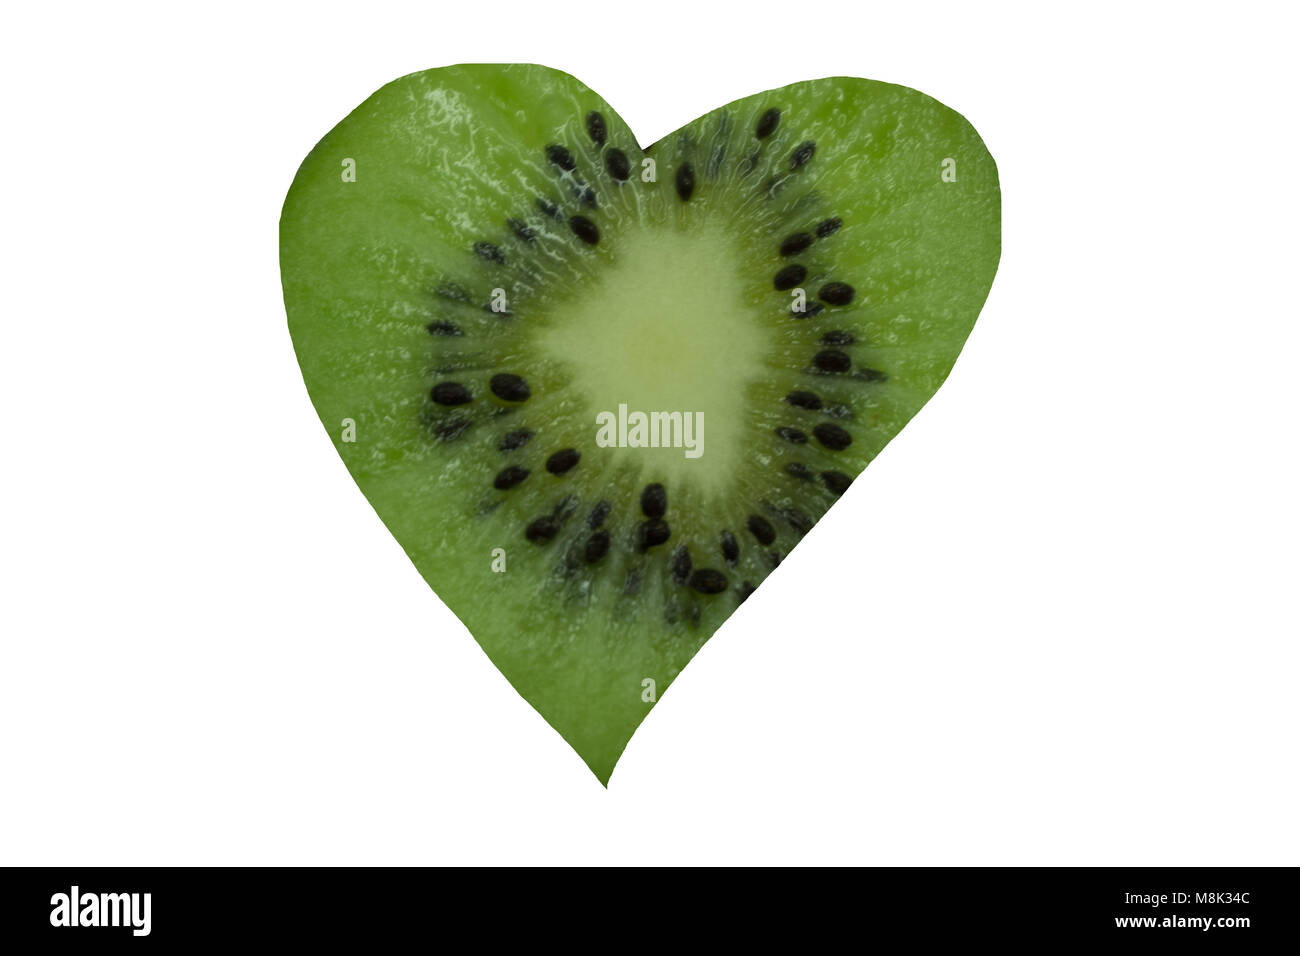 heart cardiovascular with heart-shaped, garlic - Stock Image